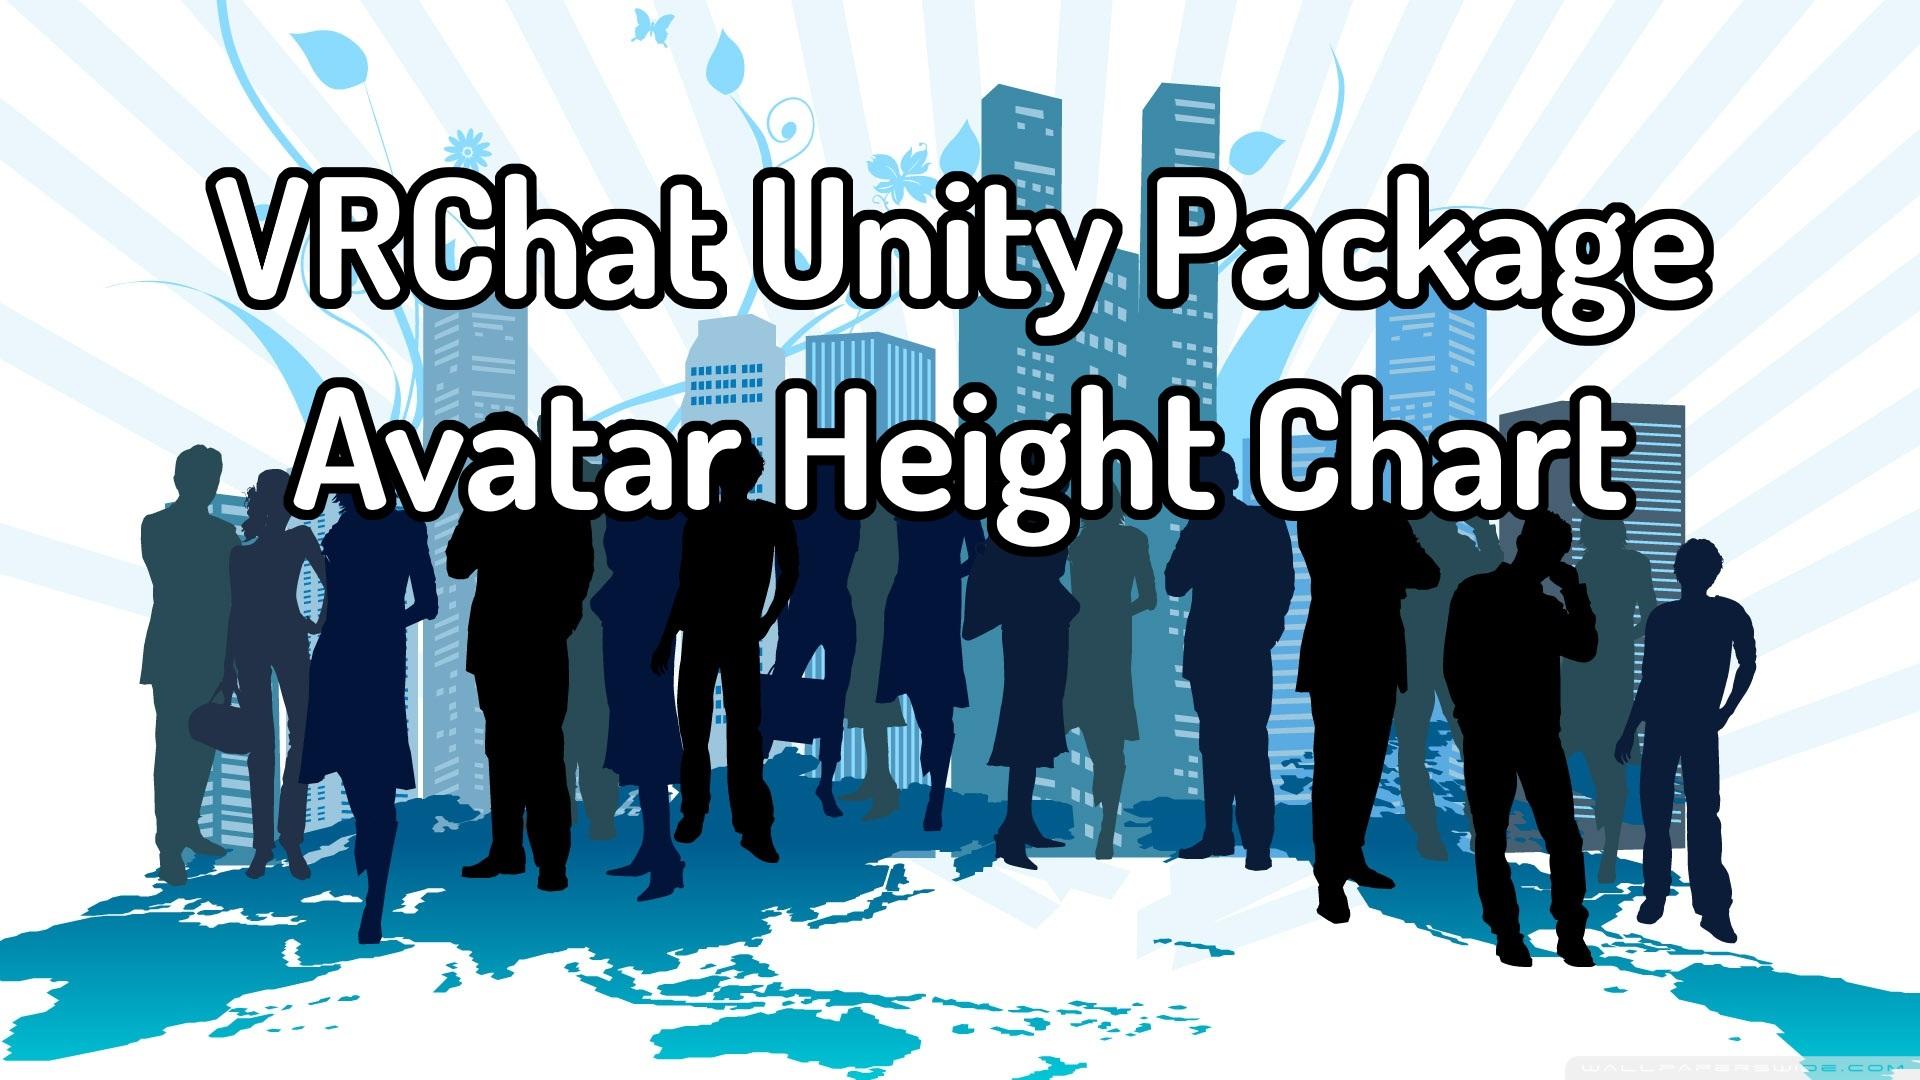 VRChat] - Avatar Height Chart by DJWolf-3 on DeviantArt